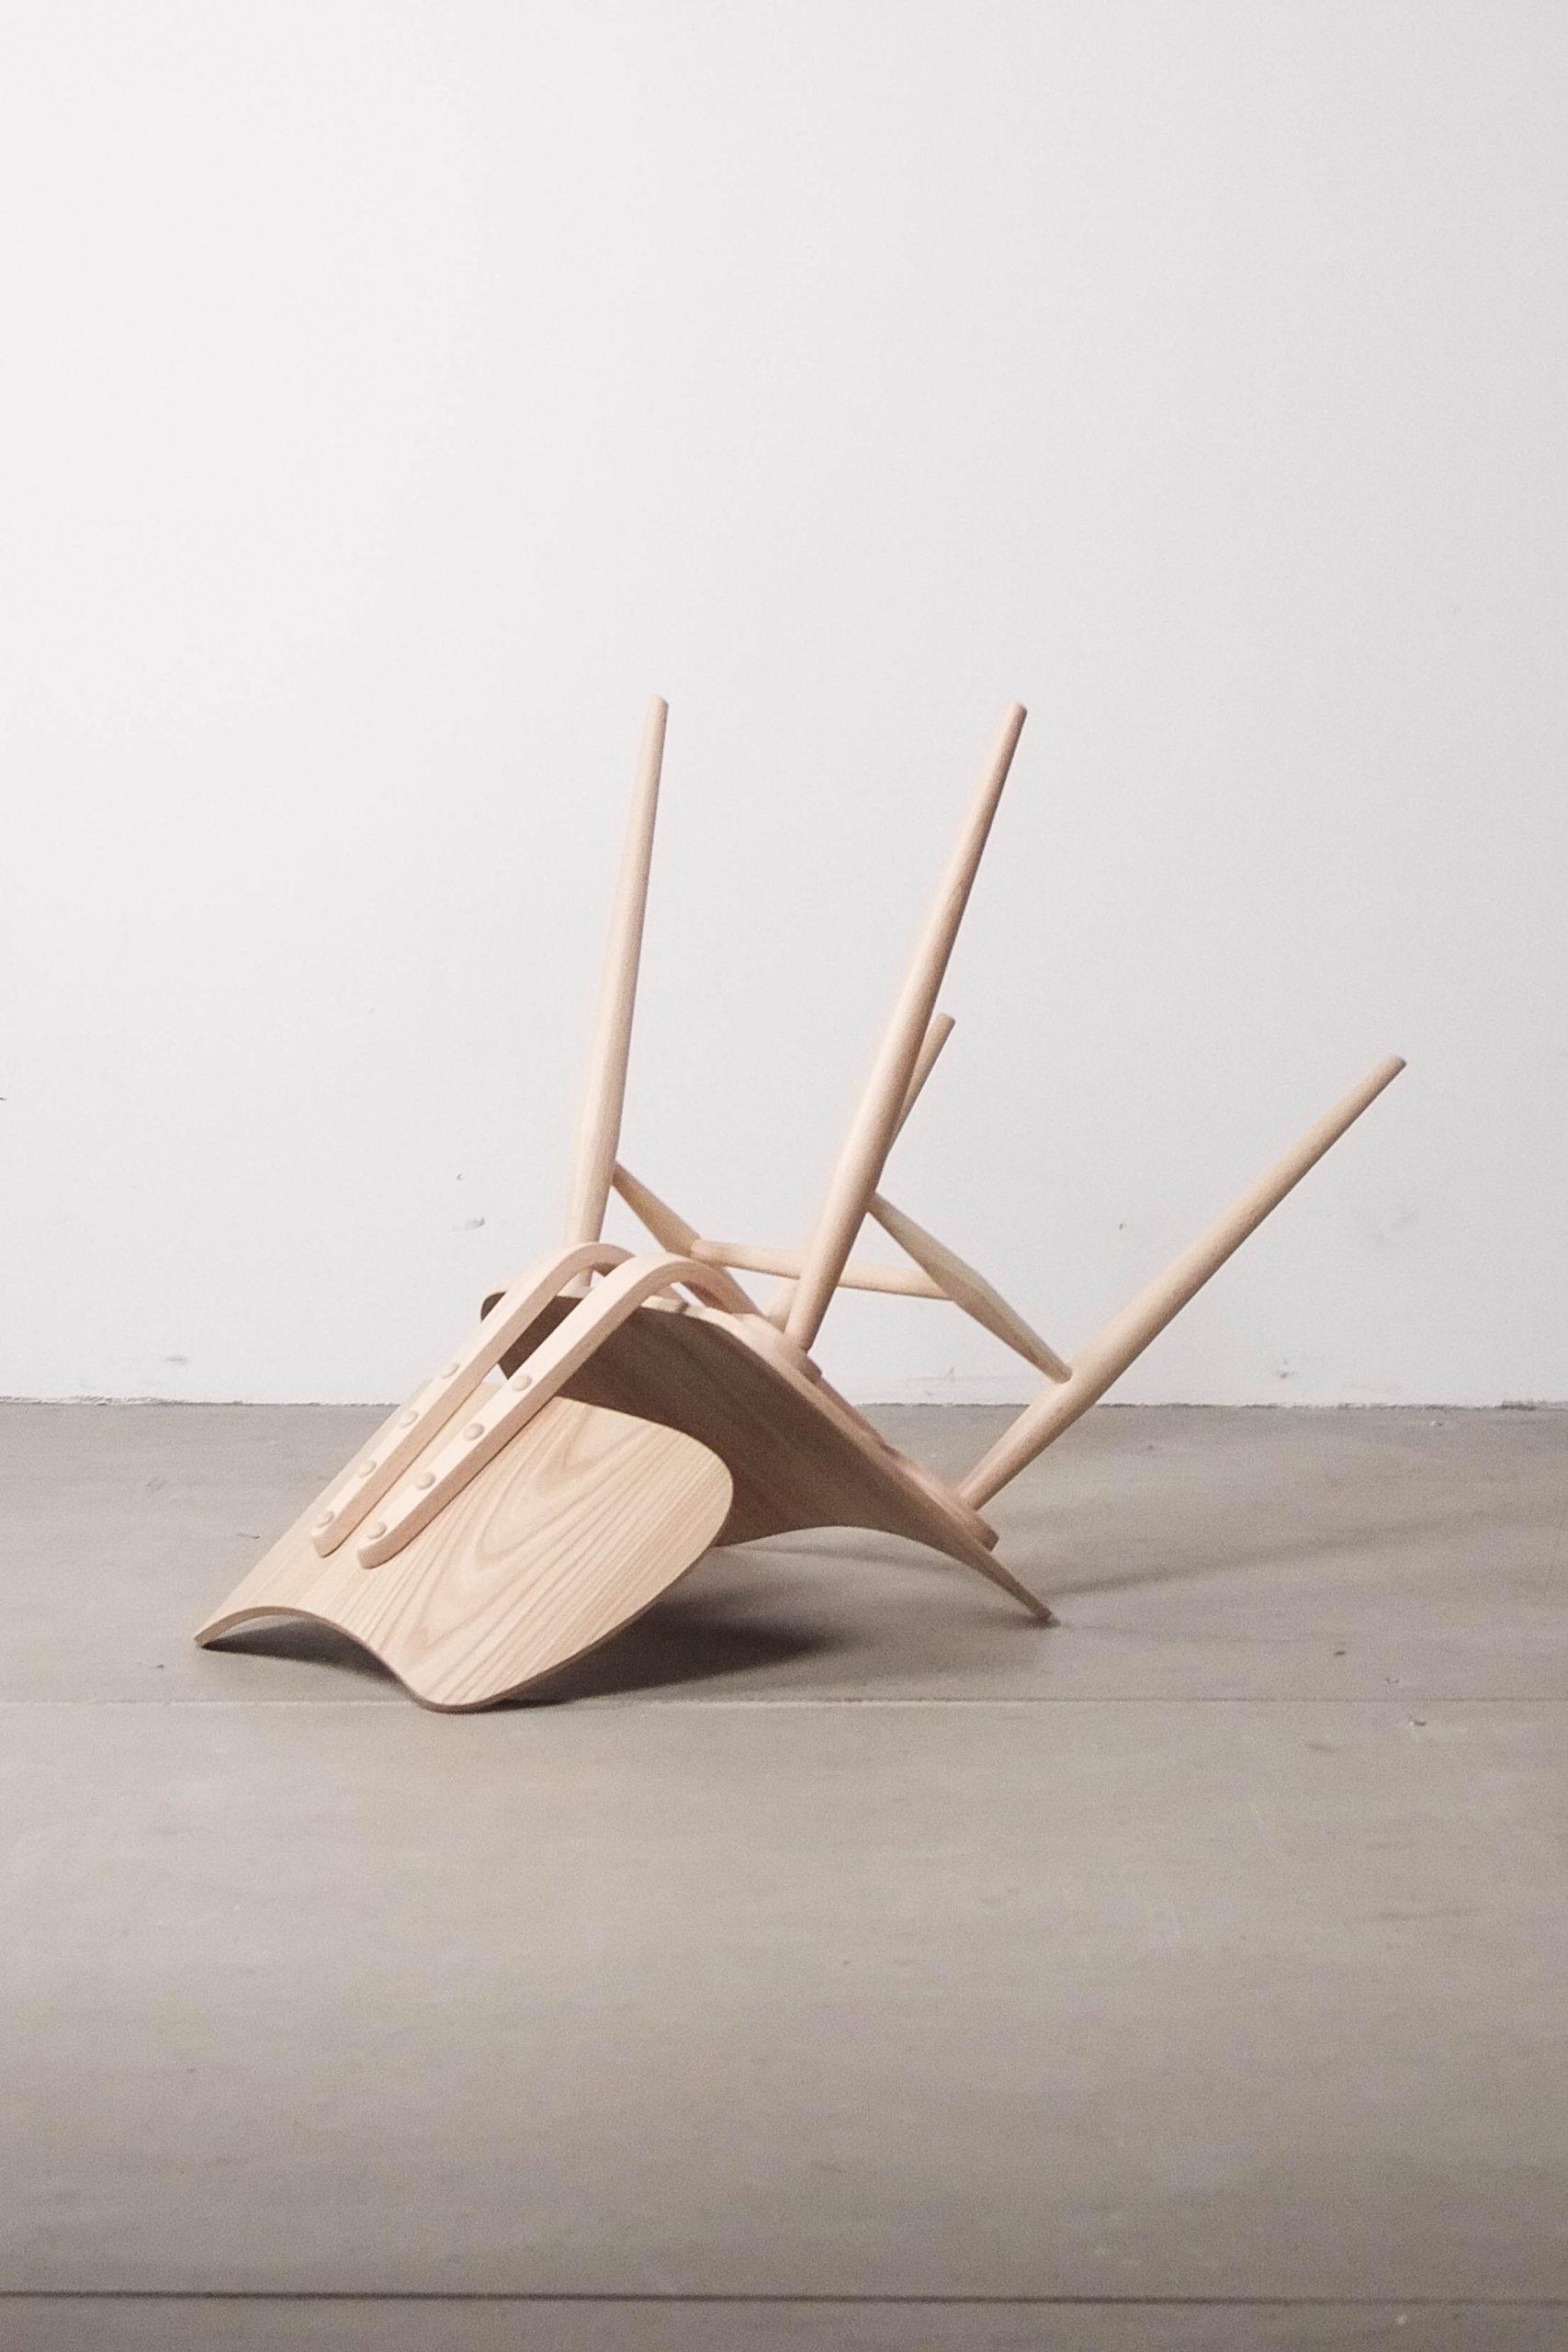 silla ercol butterfly madera de comedor de autor diseño ligera clasica windsor mariposa